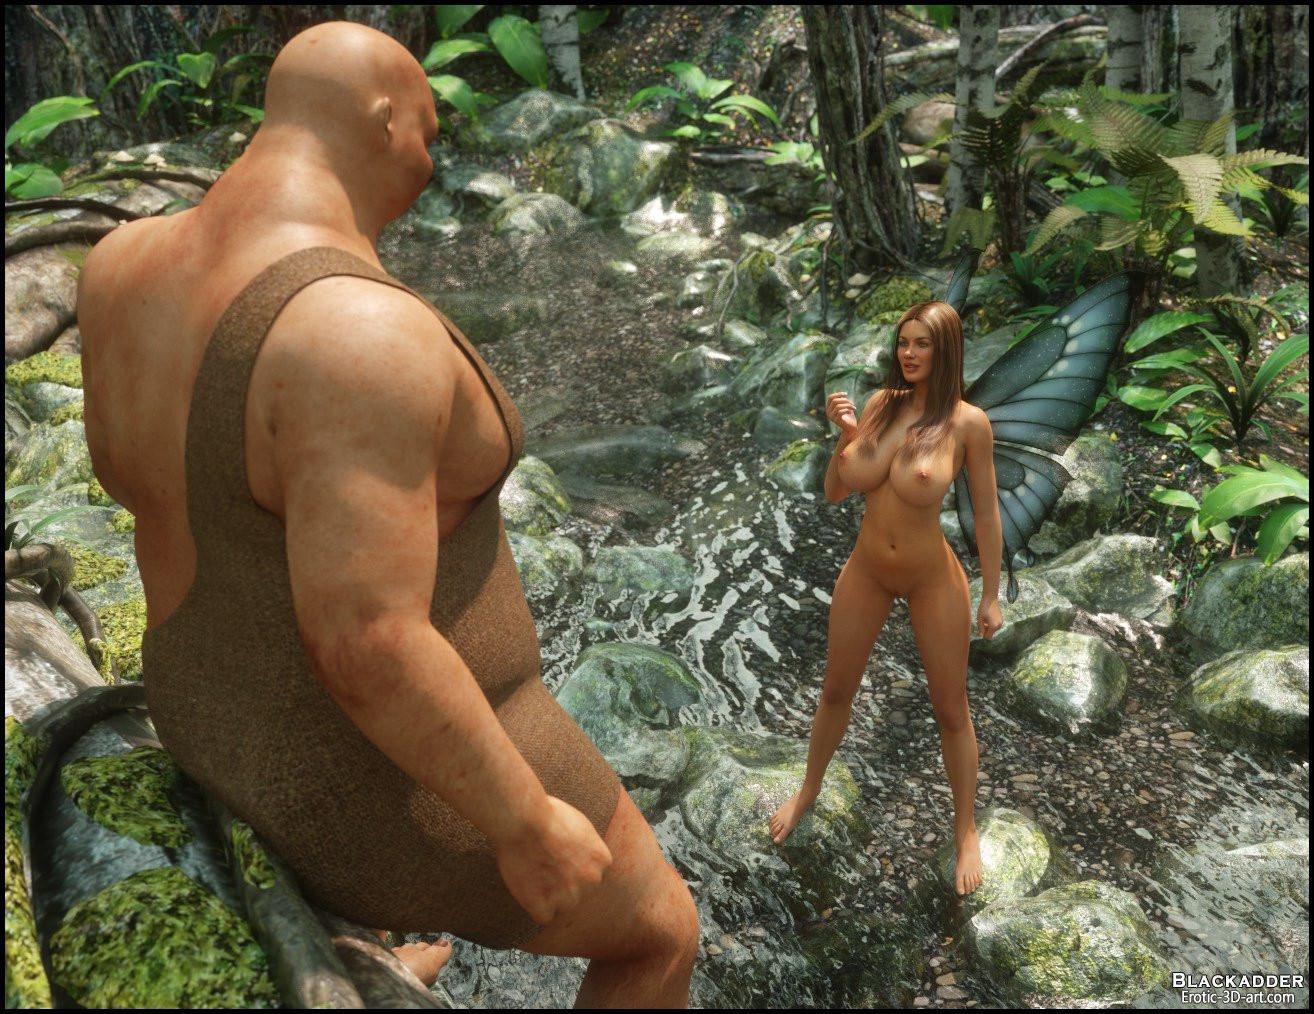 Джеймсон порно лесная фея порно будка